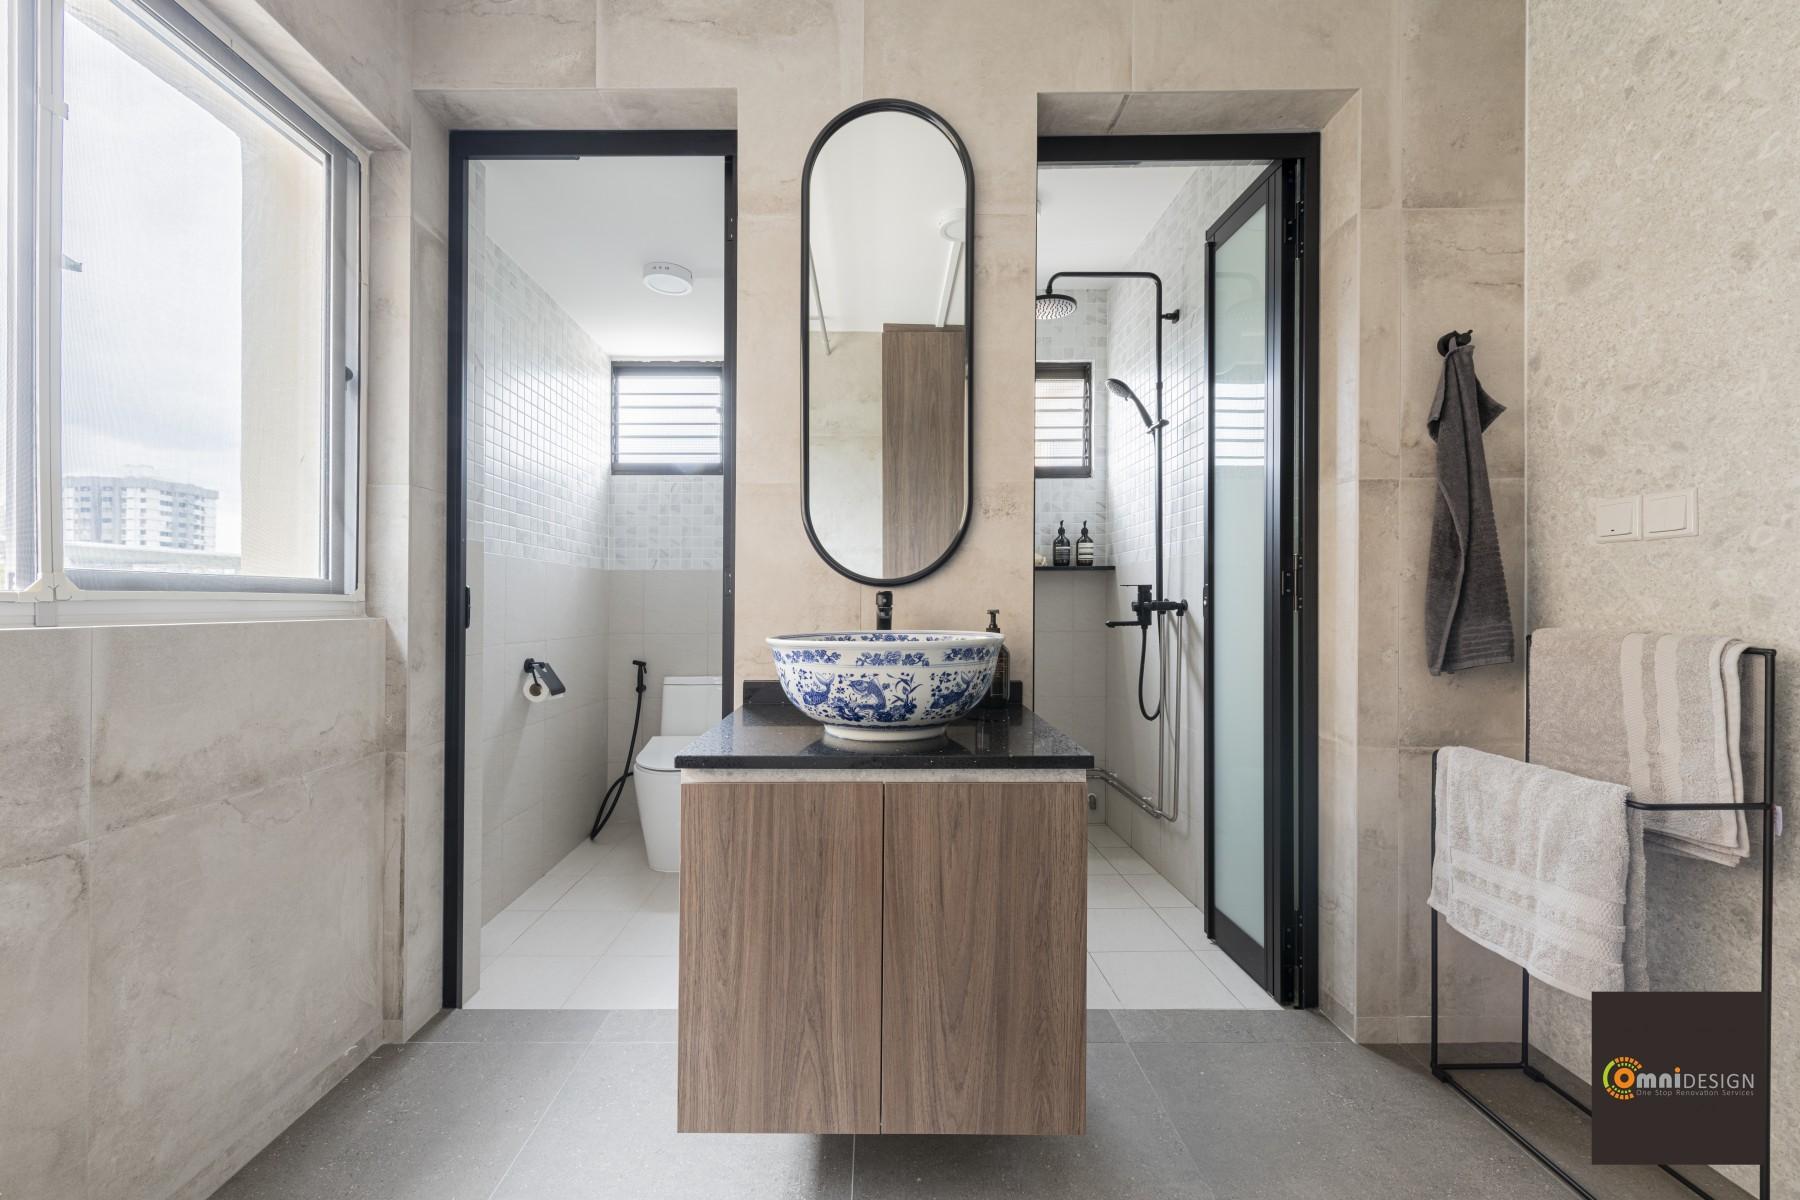 toilets comtemporary 3rm hdb